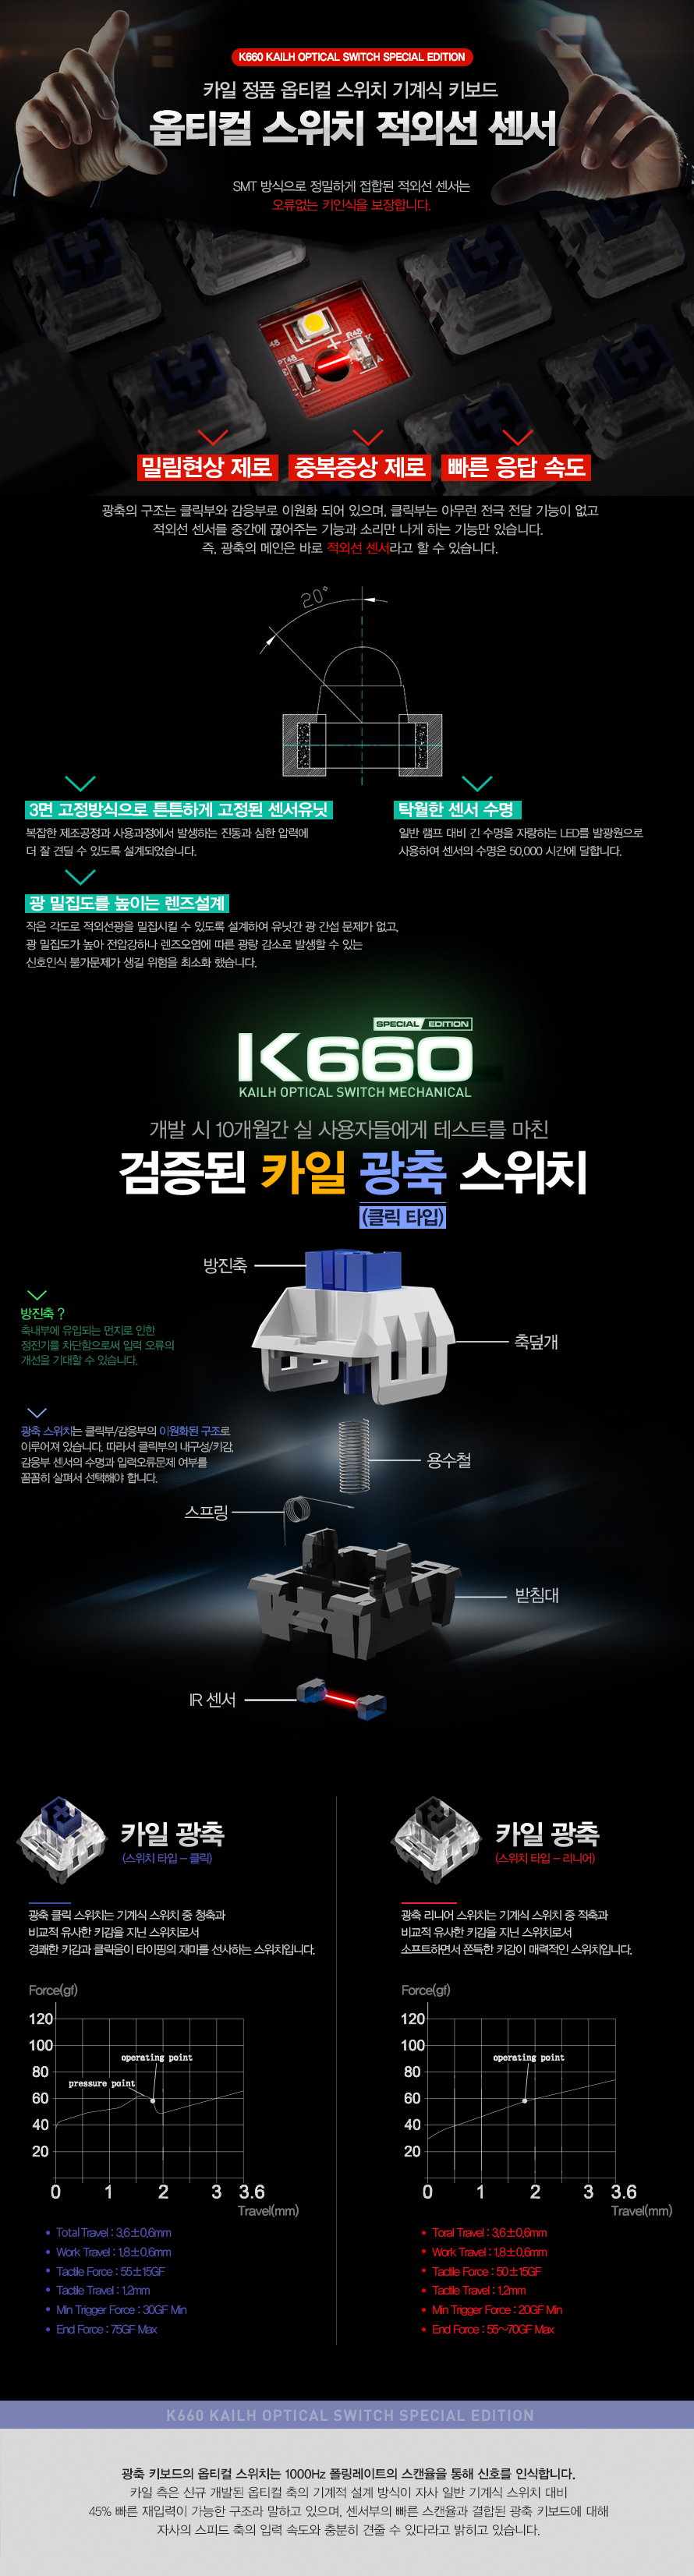 ABKO HACKER K660 LED 에디션 카일 광축 축교환 완전방수 게이밍(블랙, 클릭)